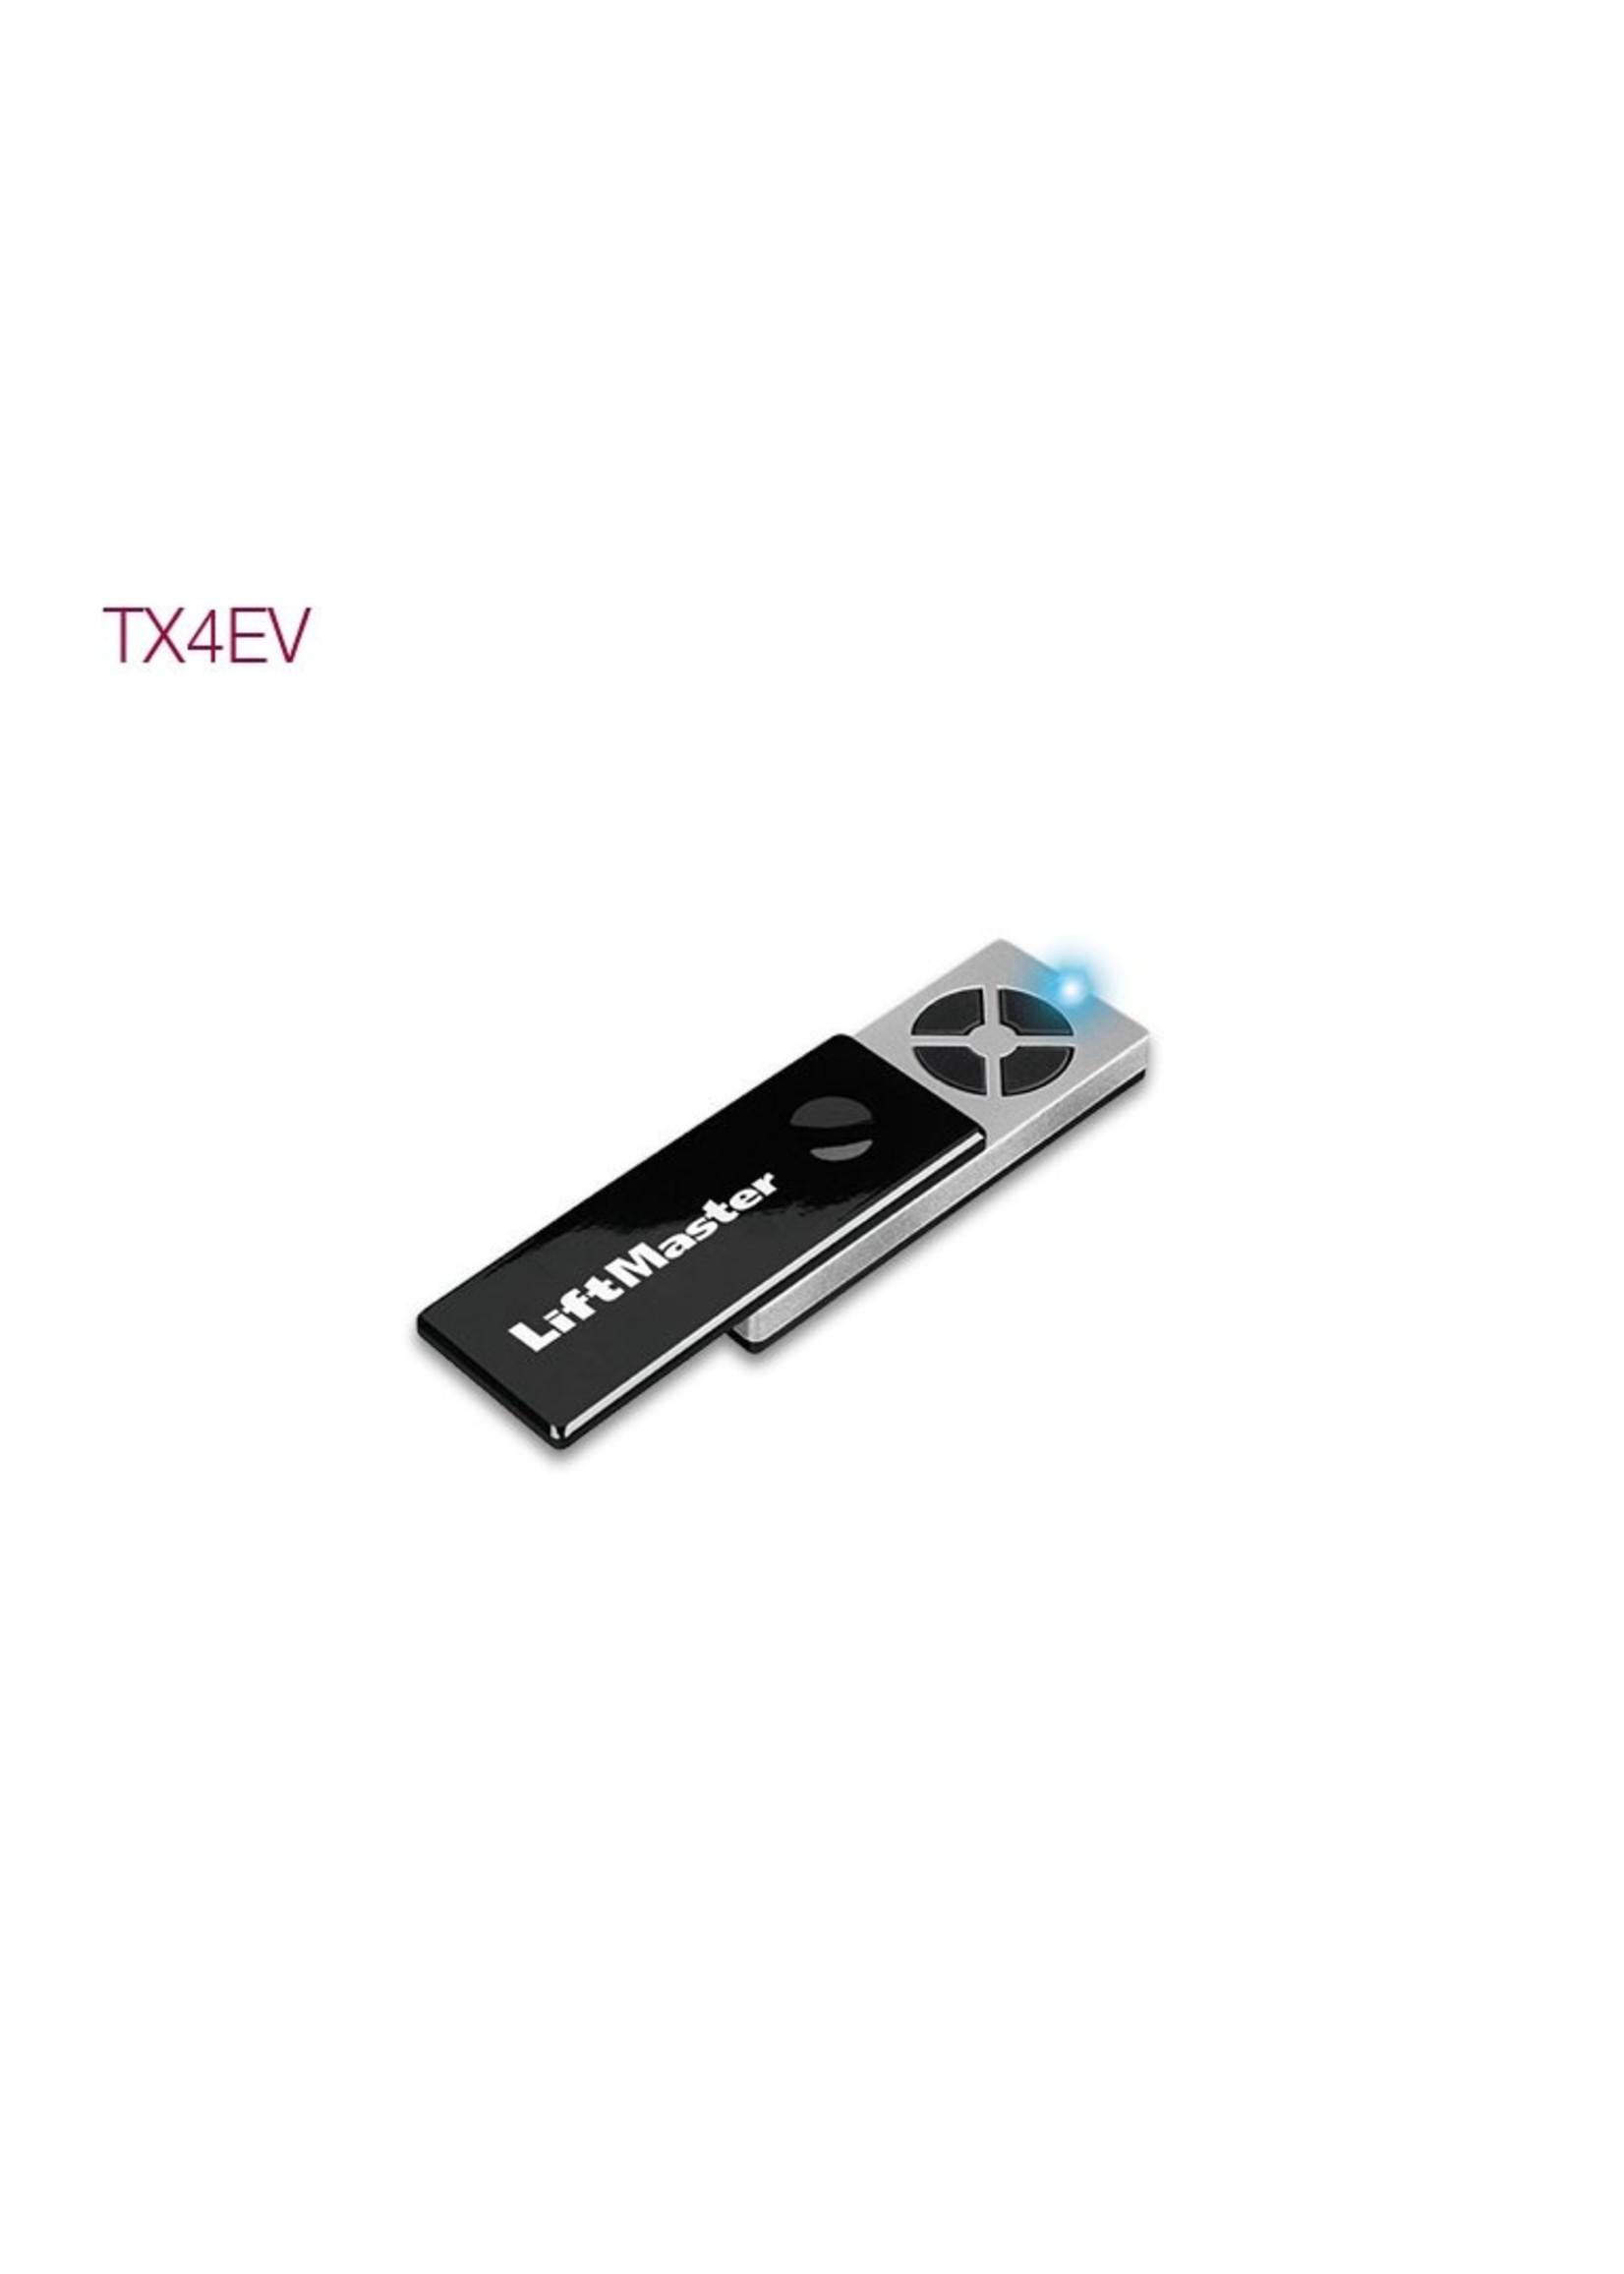 Liftmaster Télécommande 4 canaux 868 MHz TX4EV